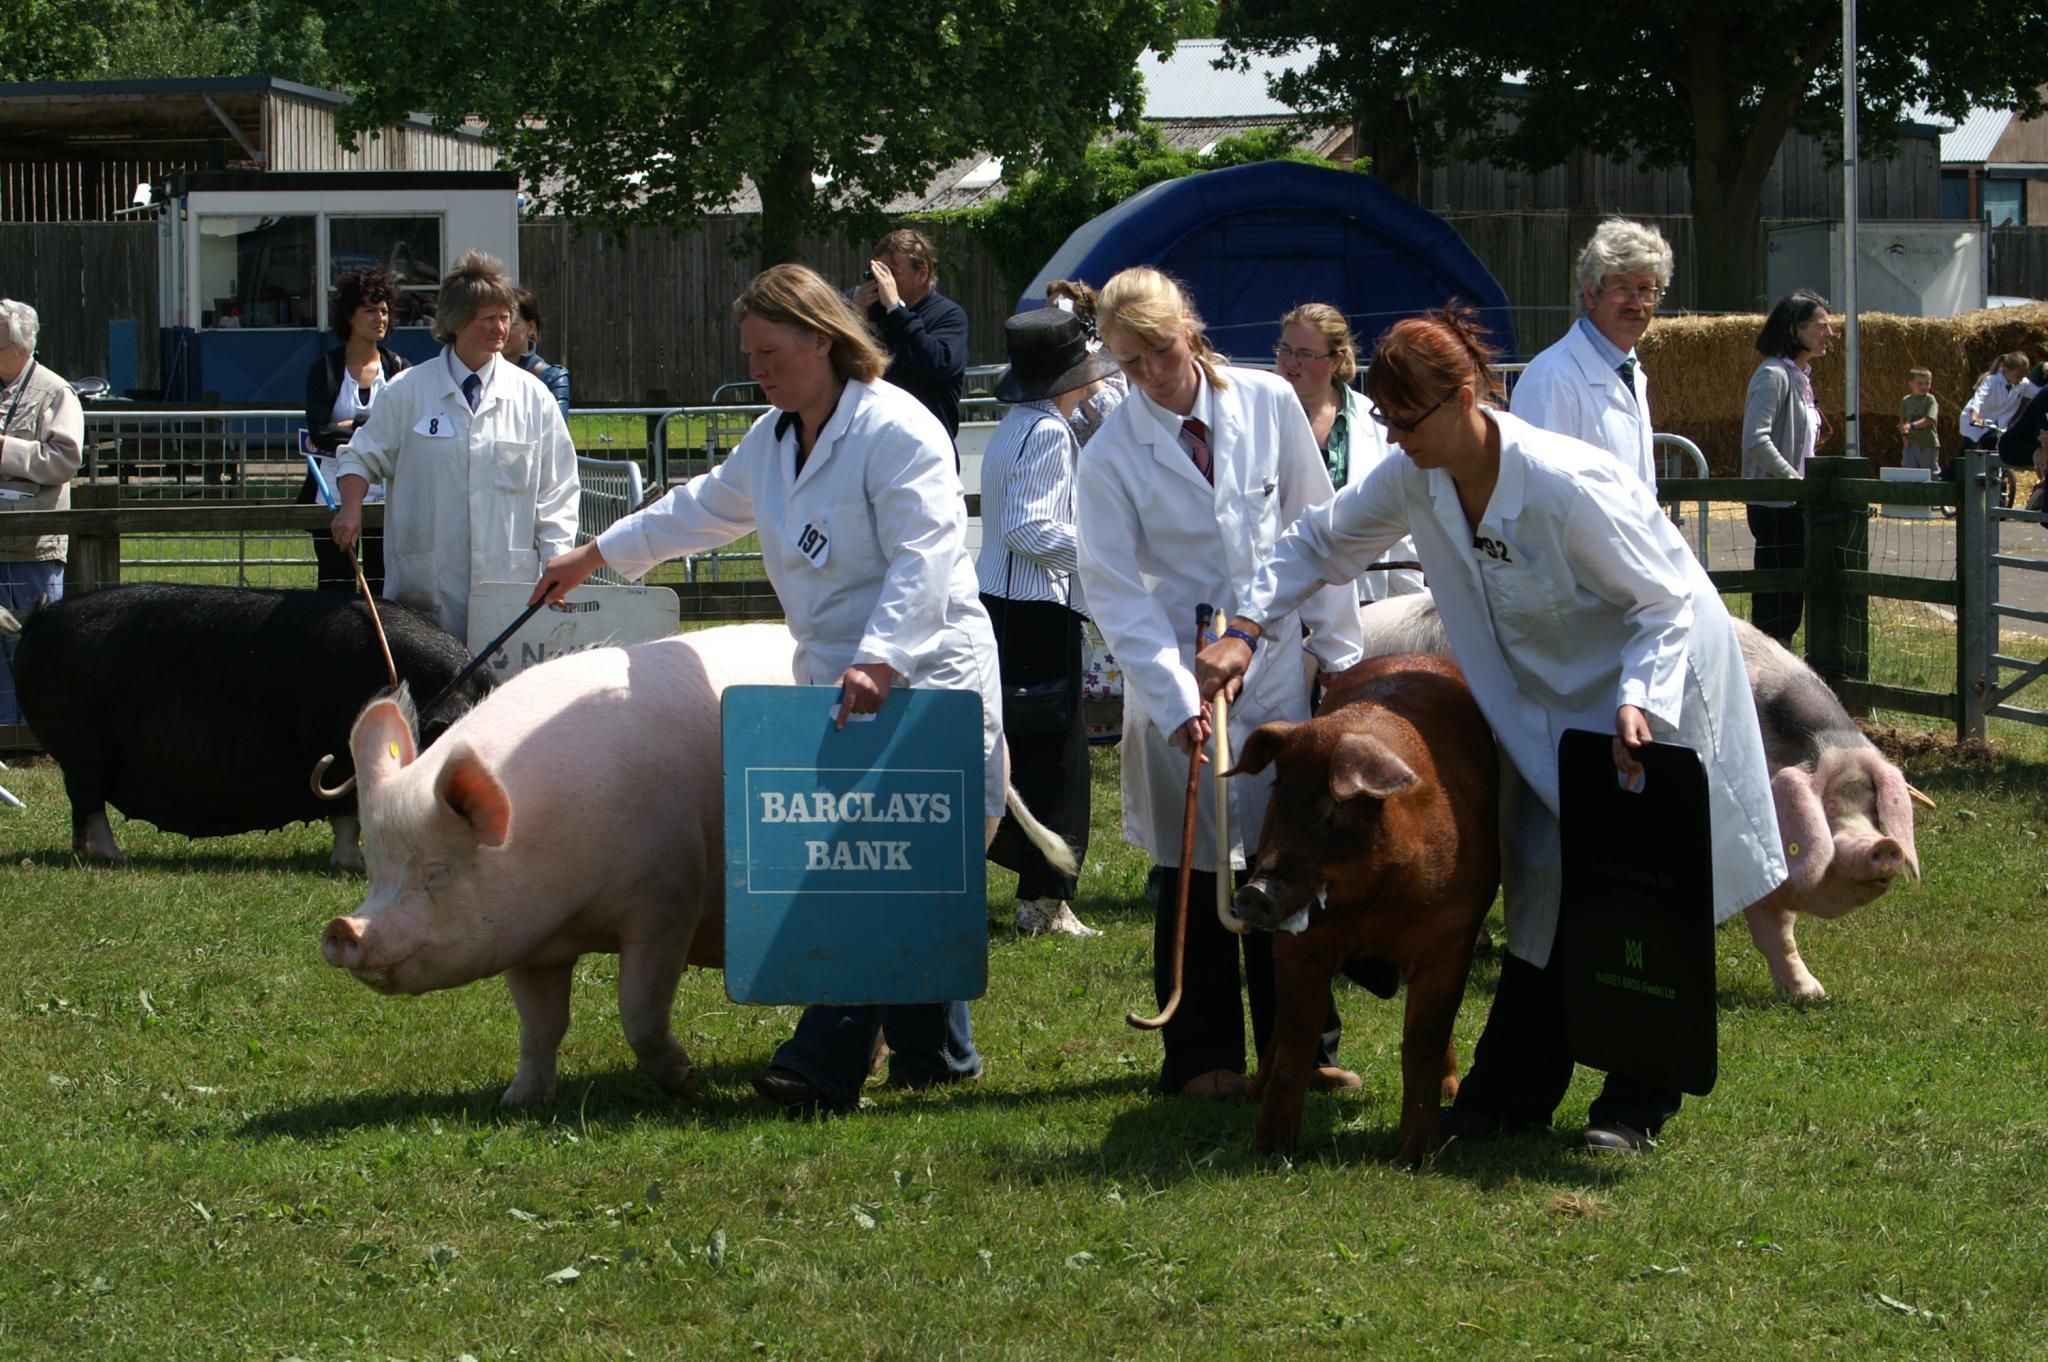 Pig show - Wikipedia